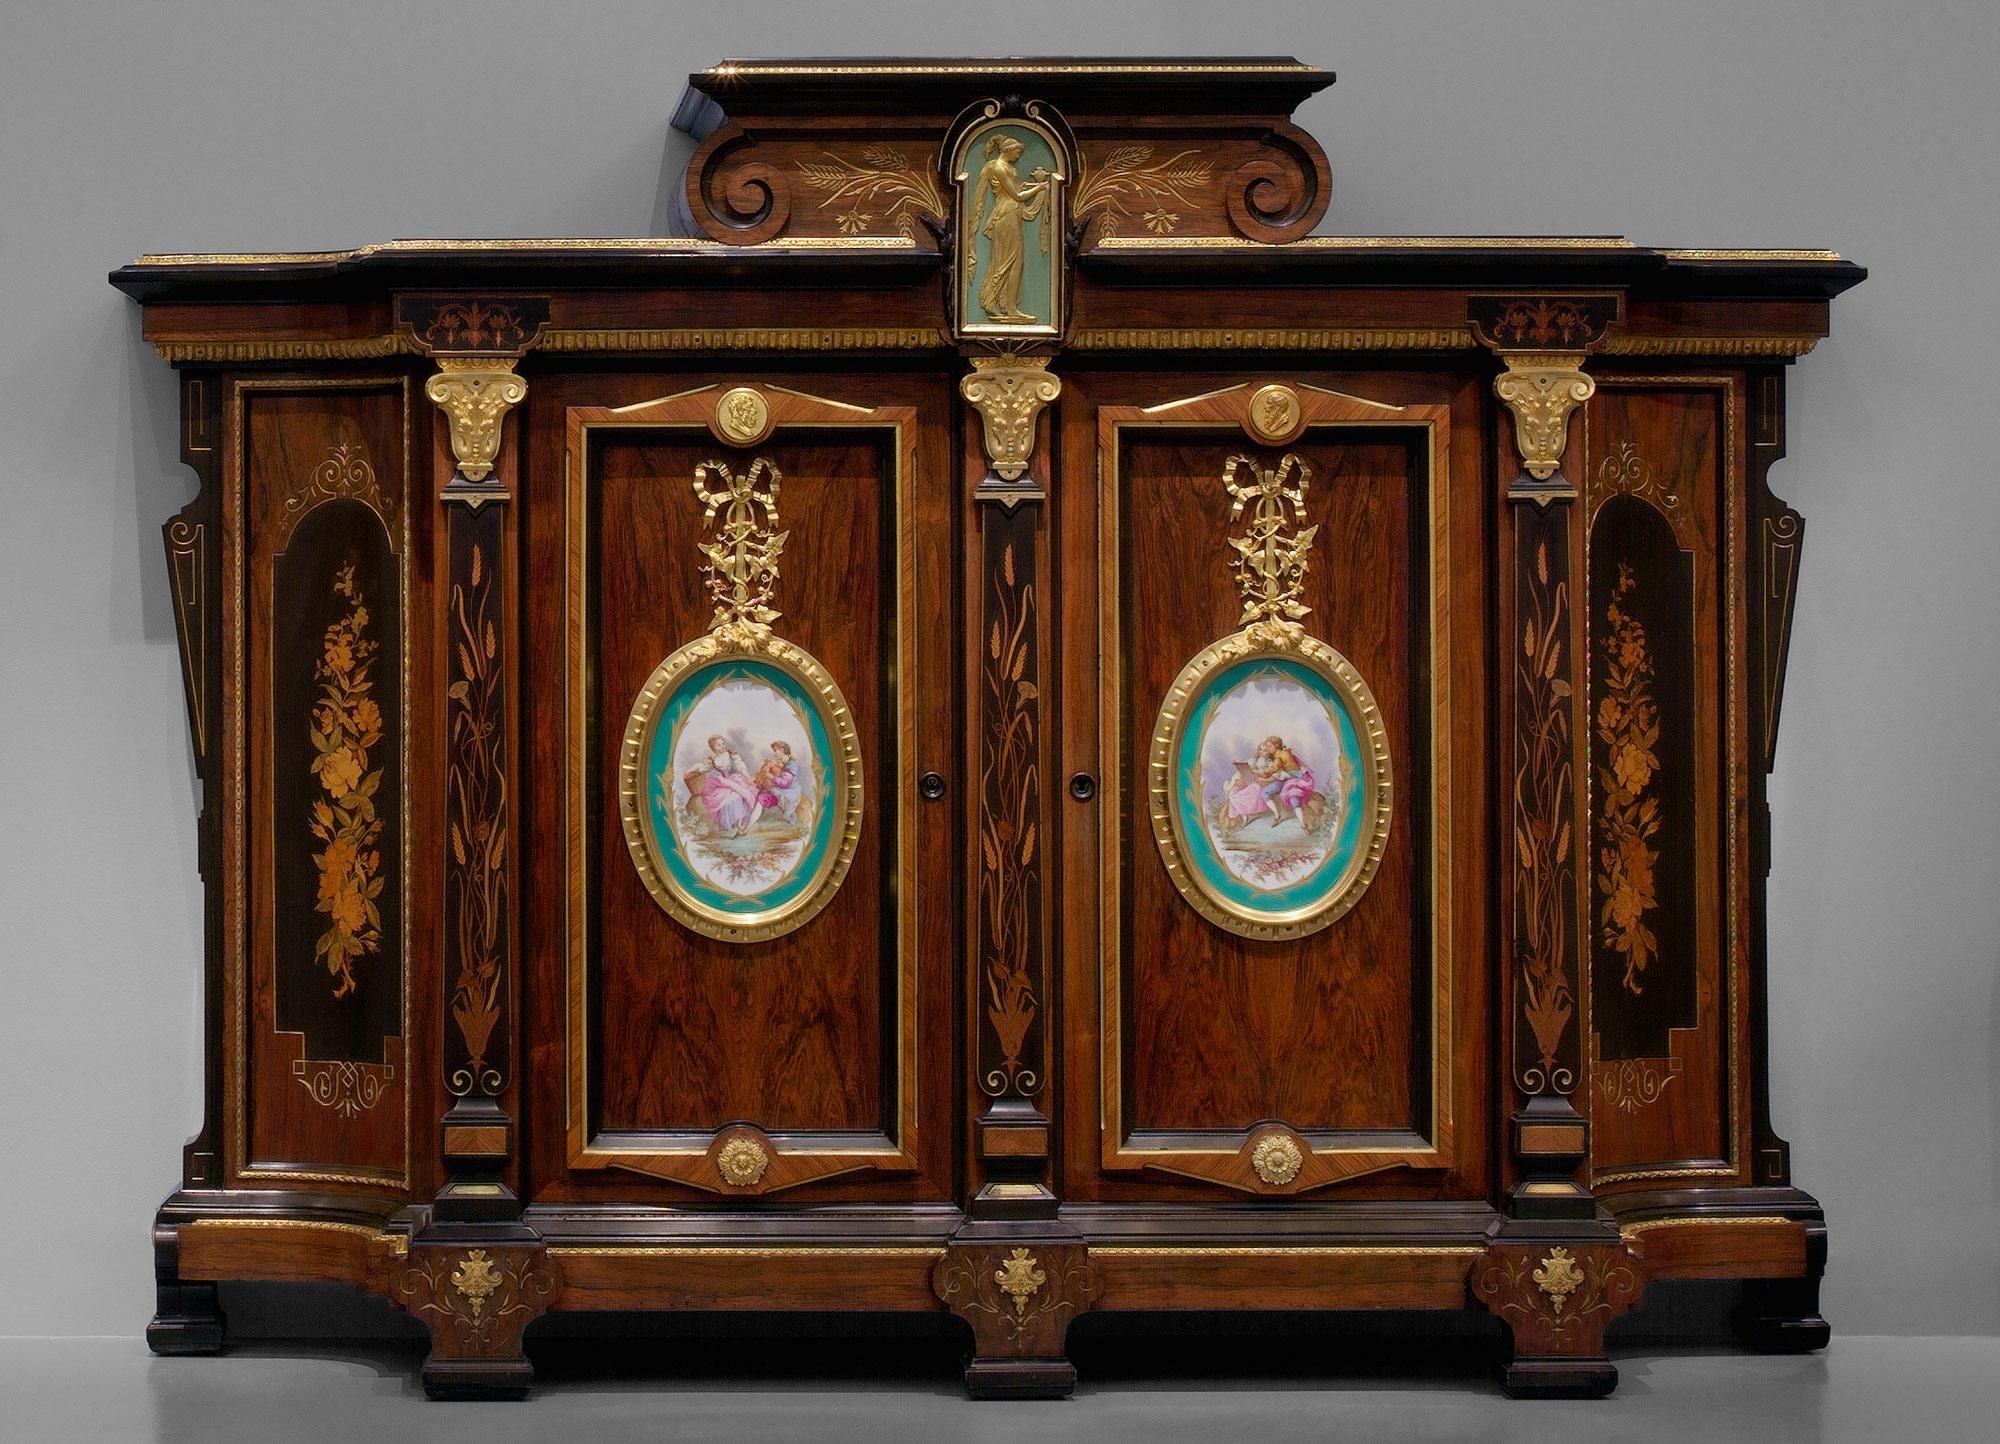 Cabinet Alexander Roux 68 100 1 Work Of Art